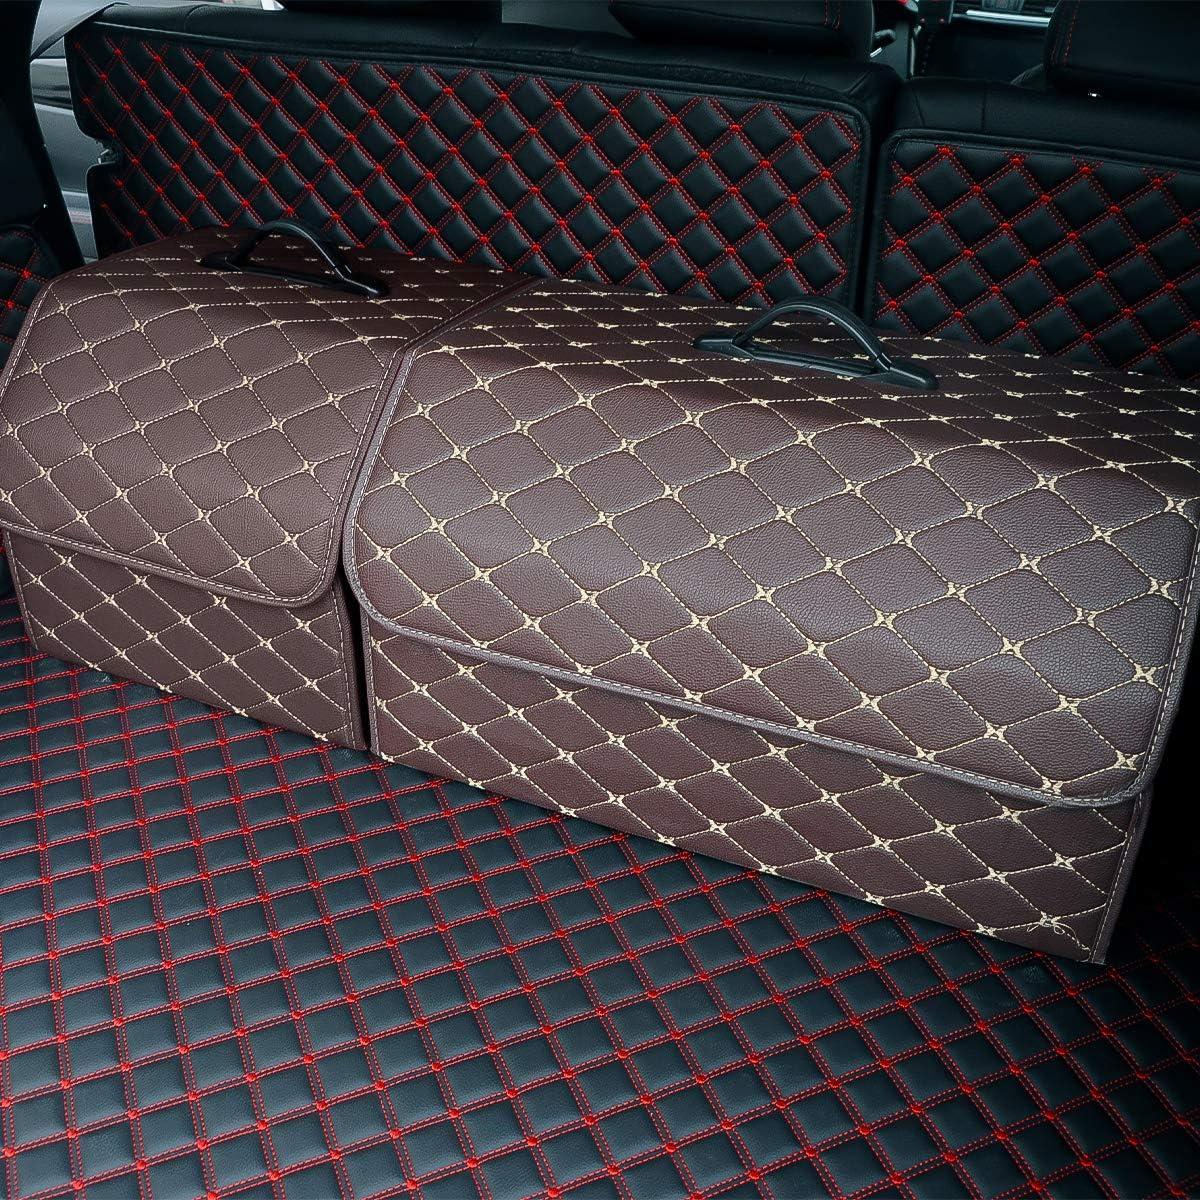 Black-L Ergocar Car Trunk Organizer Foldable Car Boot Tidy Storage Box Waterproof PU Car Boot Storage Organiser for Car//SUV//Truck//Auto